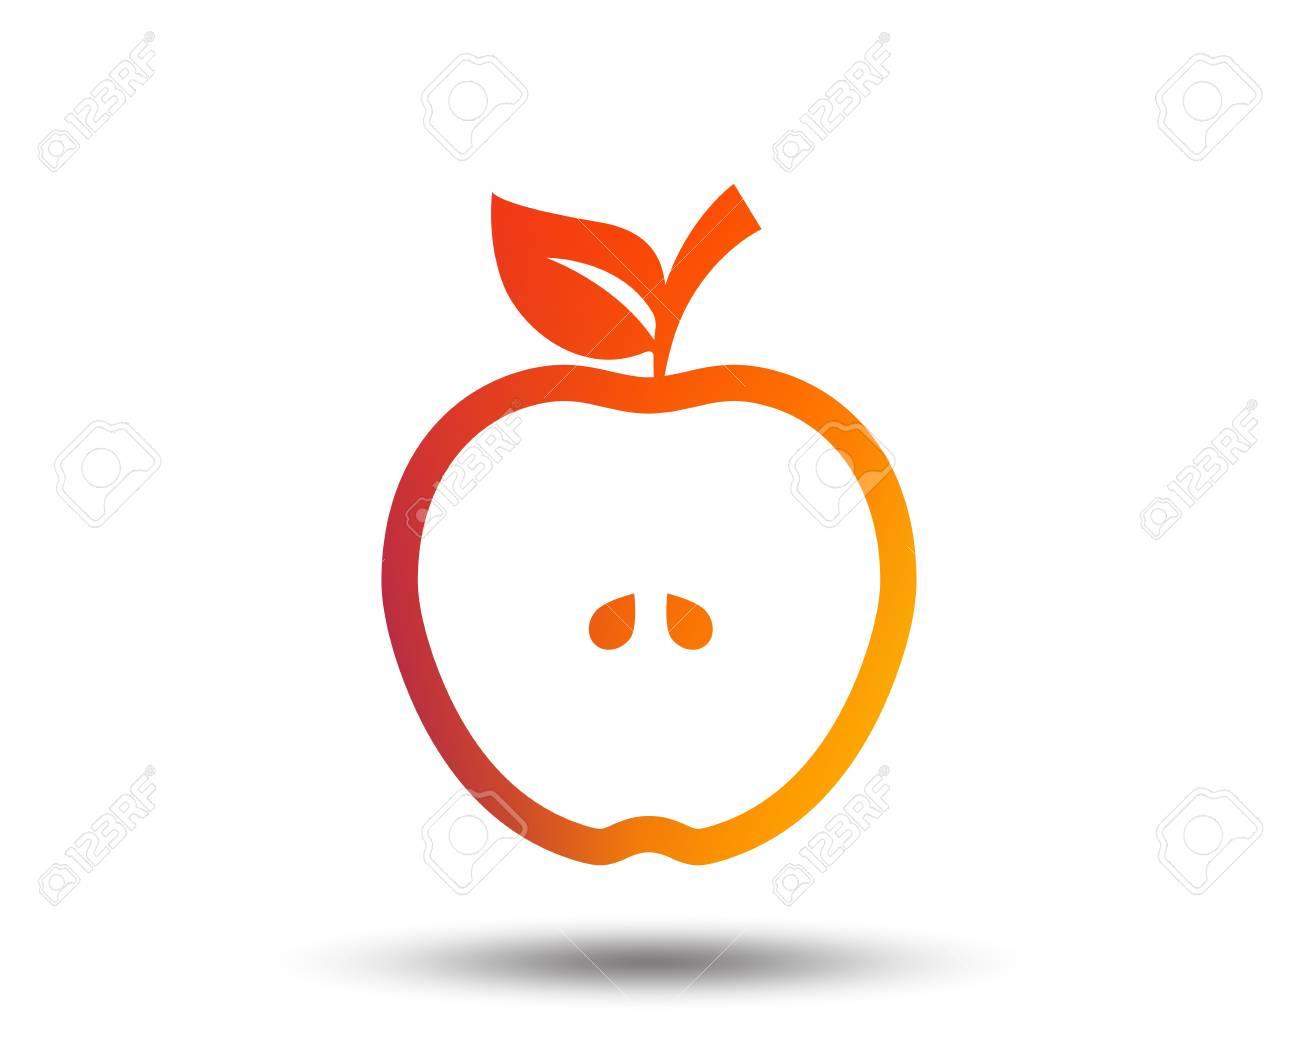 apple sign icon. fruit with leaf symbol. blurred gradient design